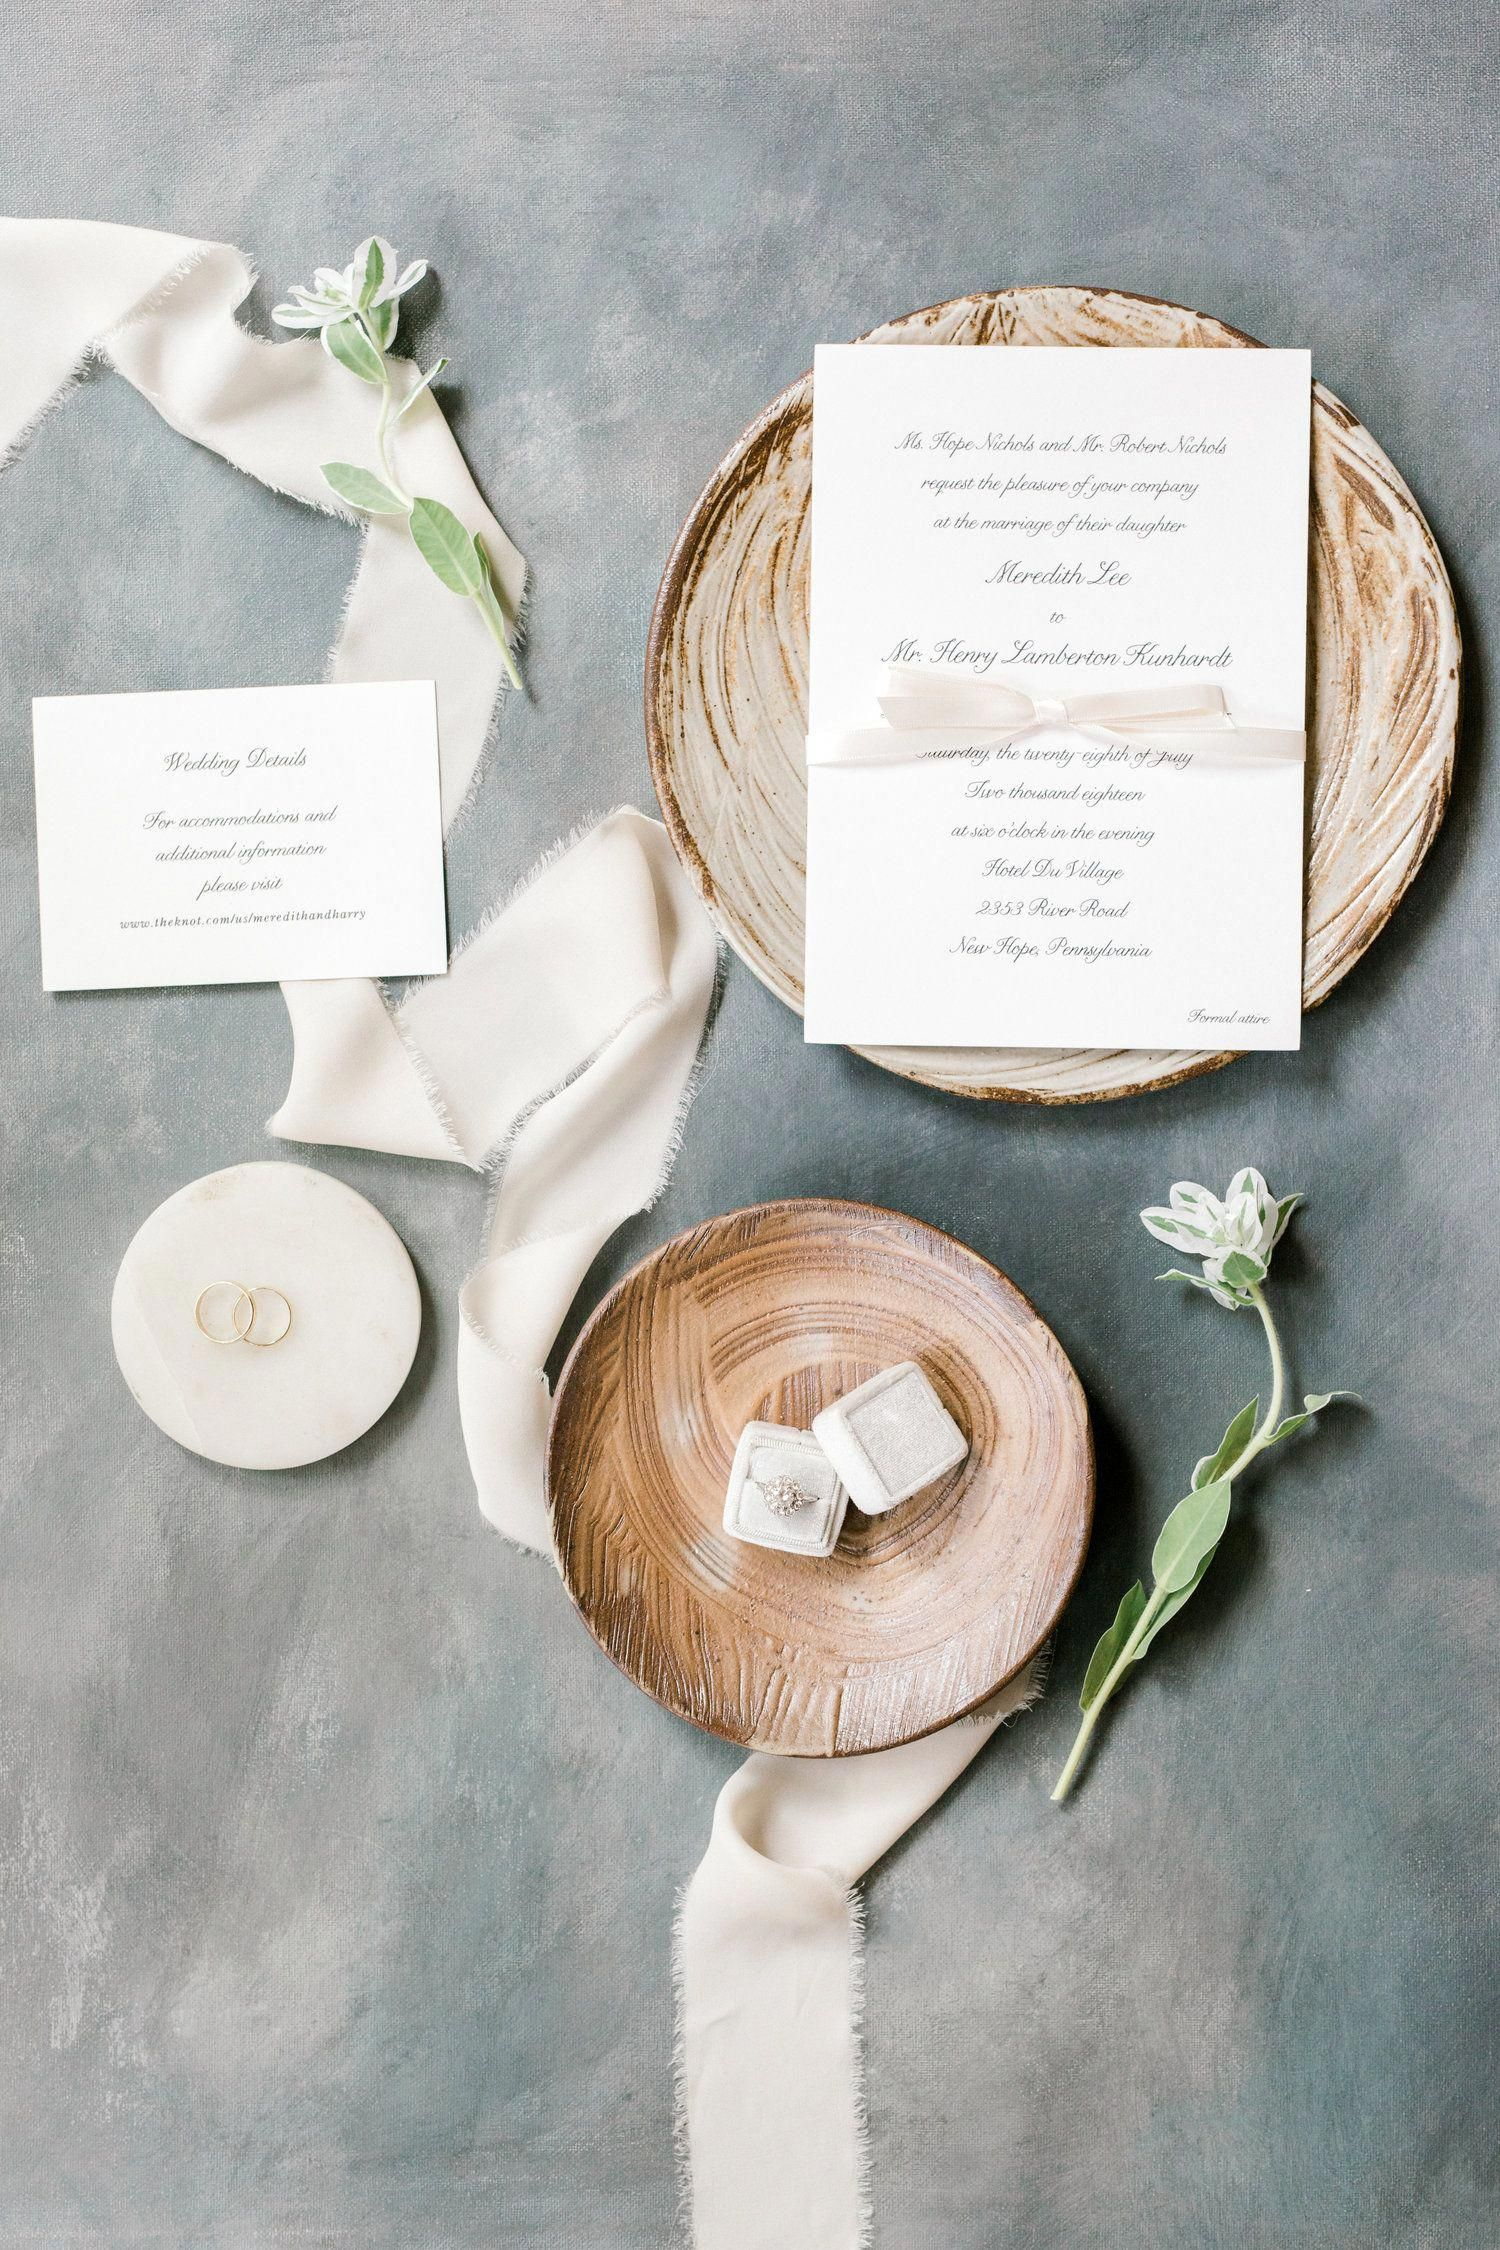 Must see this romanticweddings Wedding details